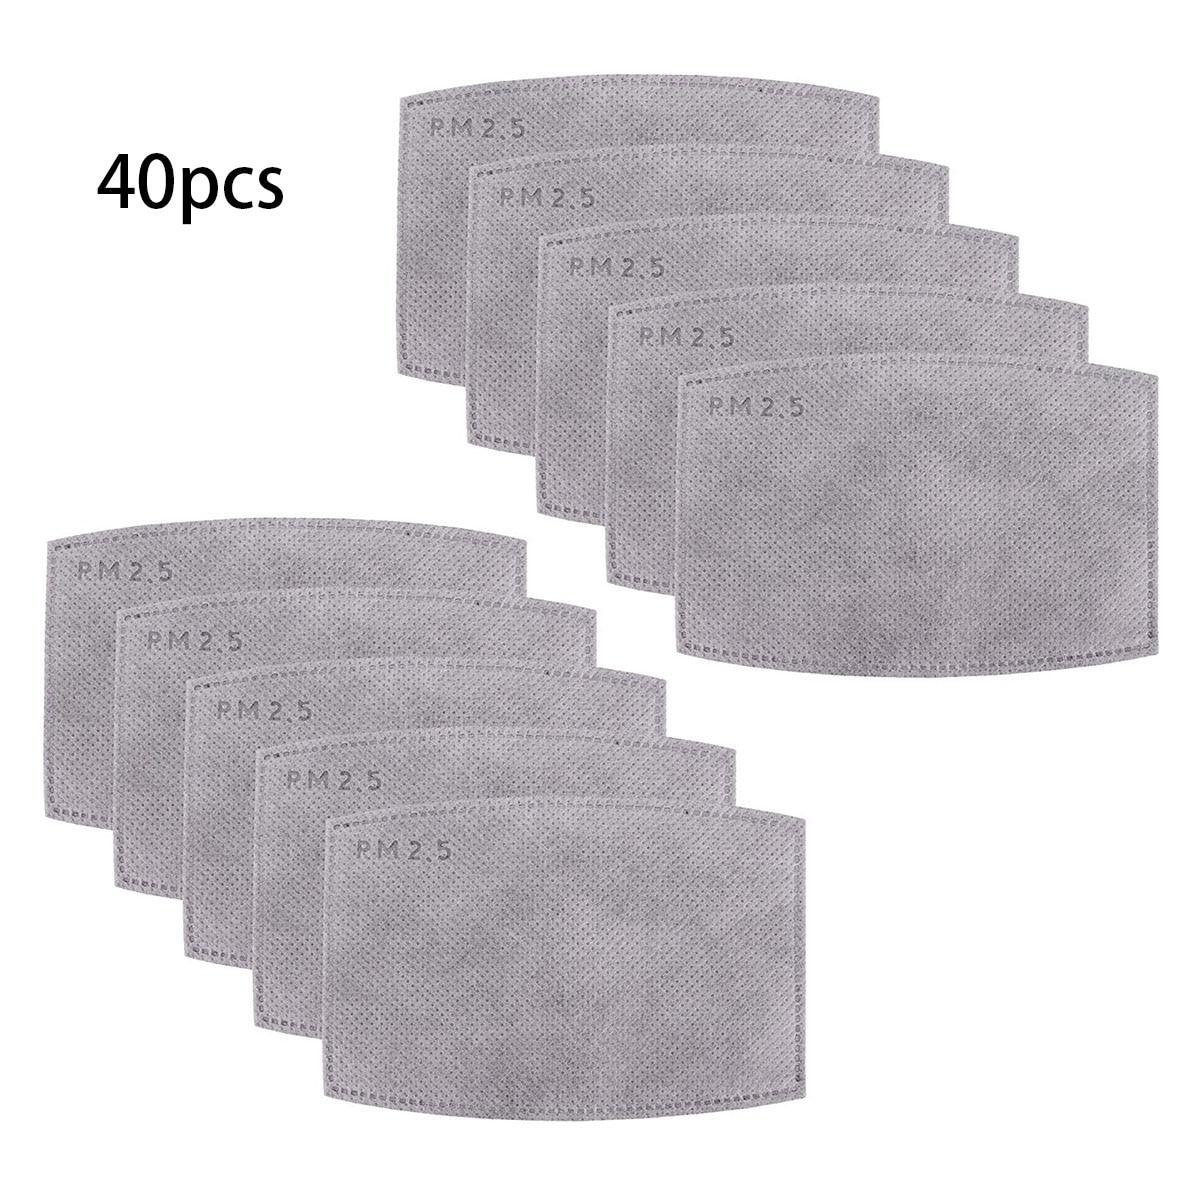 40/20/10pcs Fine Denier Face Mask Filter Inserts Cotton Mask Soft Wicking PM2.5 Filtration Filter Inserts Dust Mask